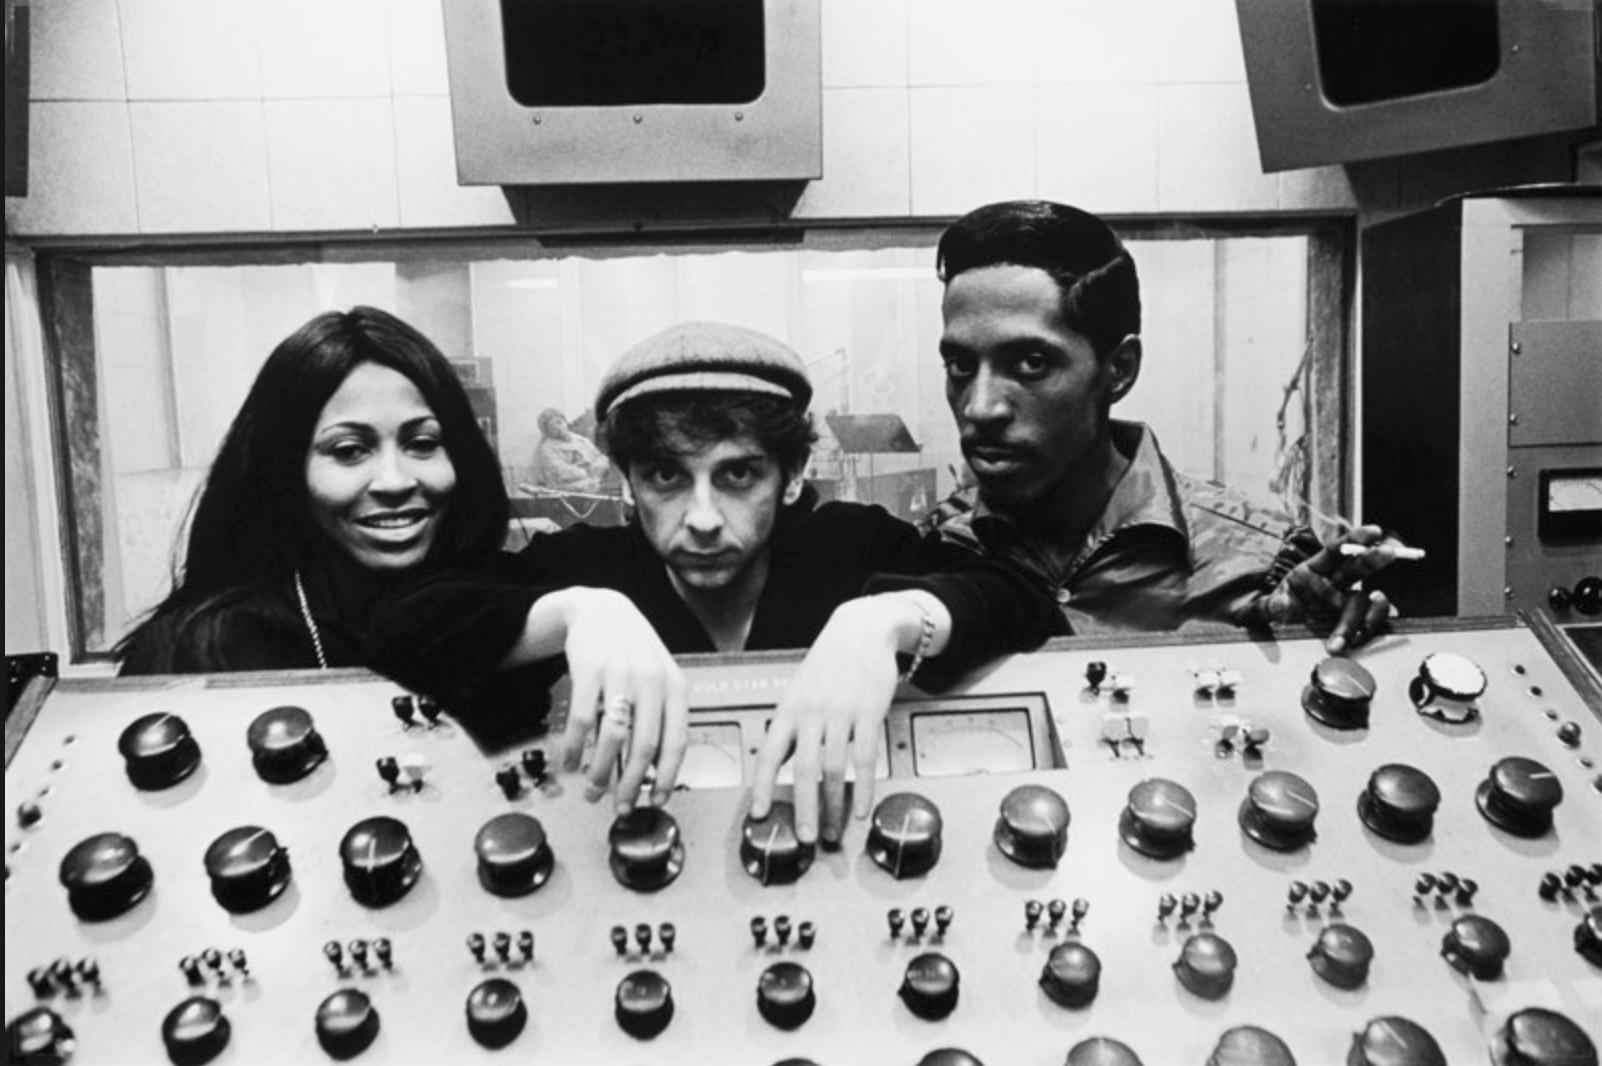 L-R: Tina Turner, Phil Spector, Ike Turner